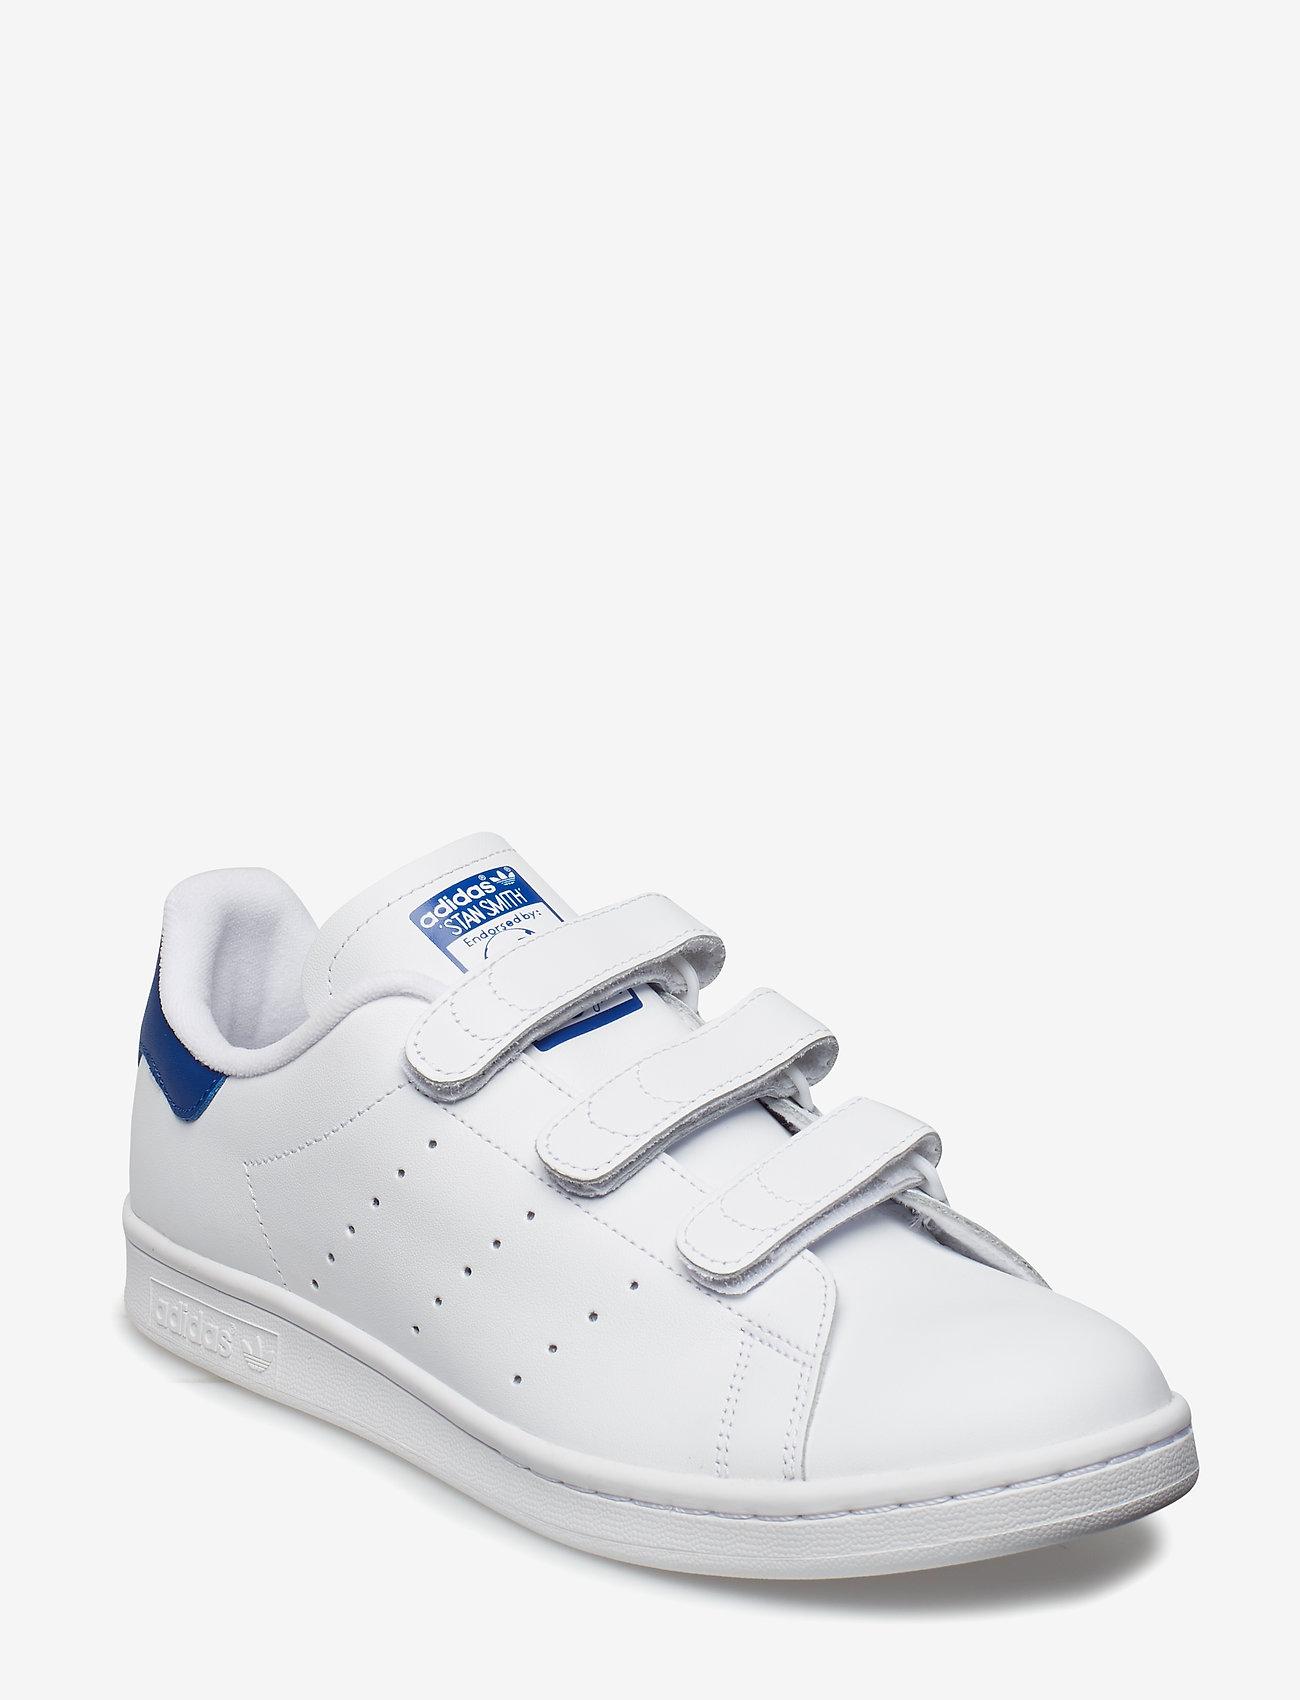 adidas Originals - STAN SMITH CF - lav ankel - ftwwht/ftwwht/croyal - 0